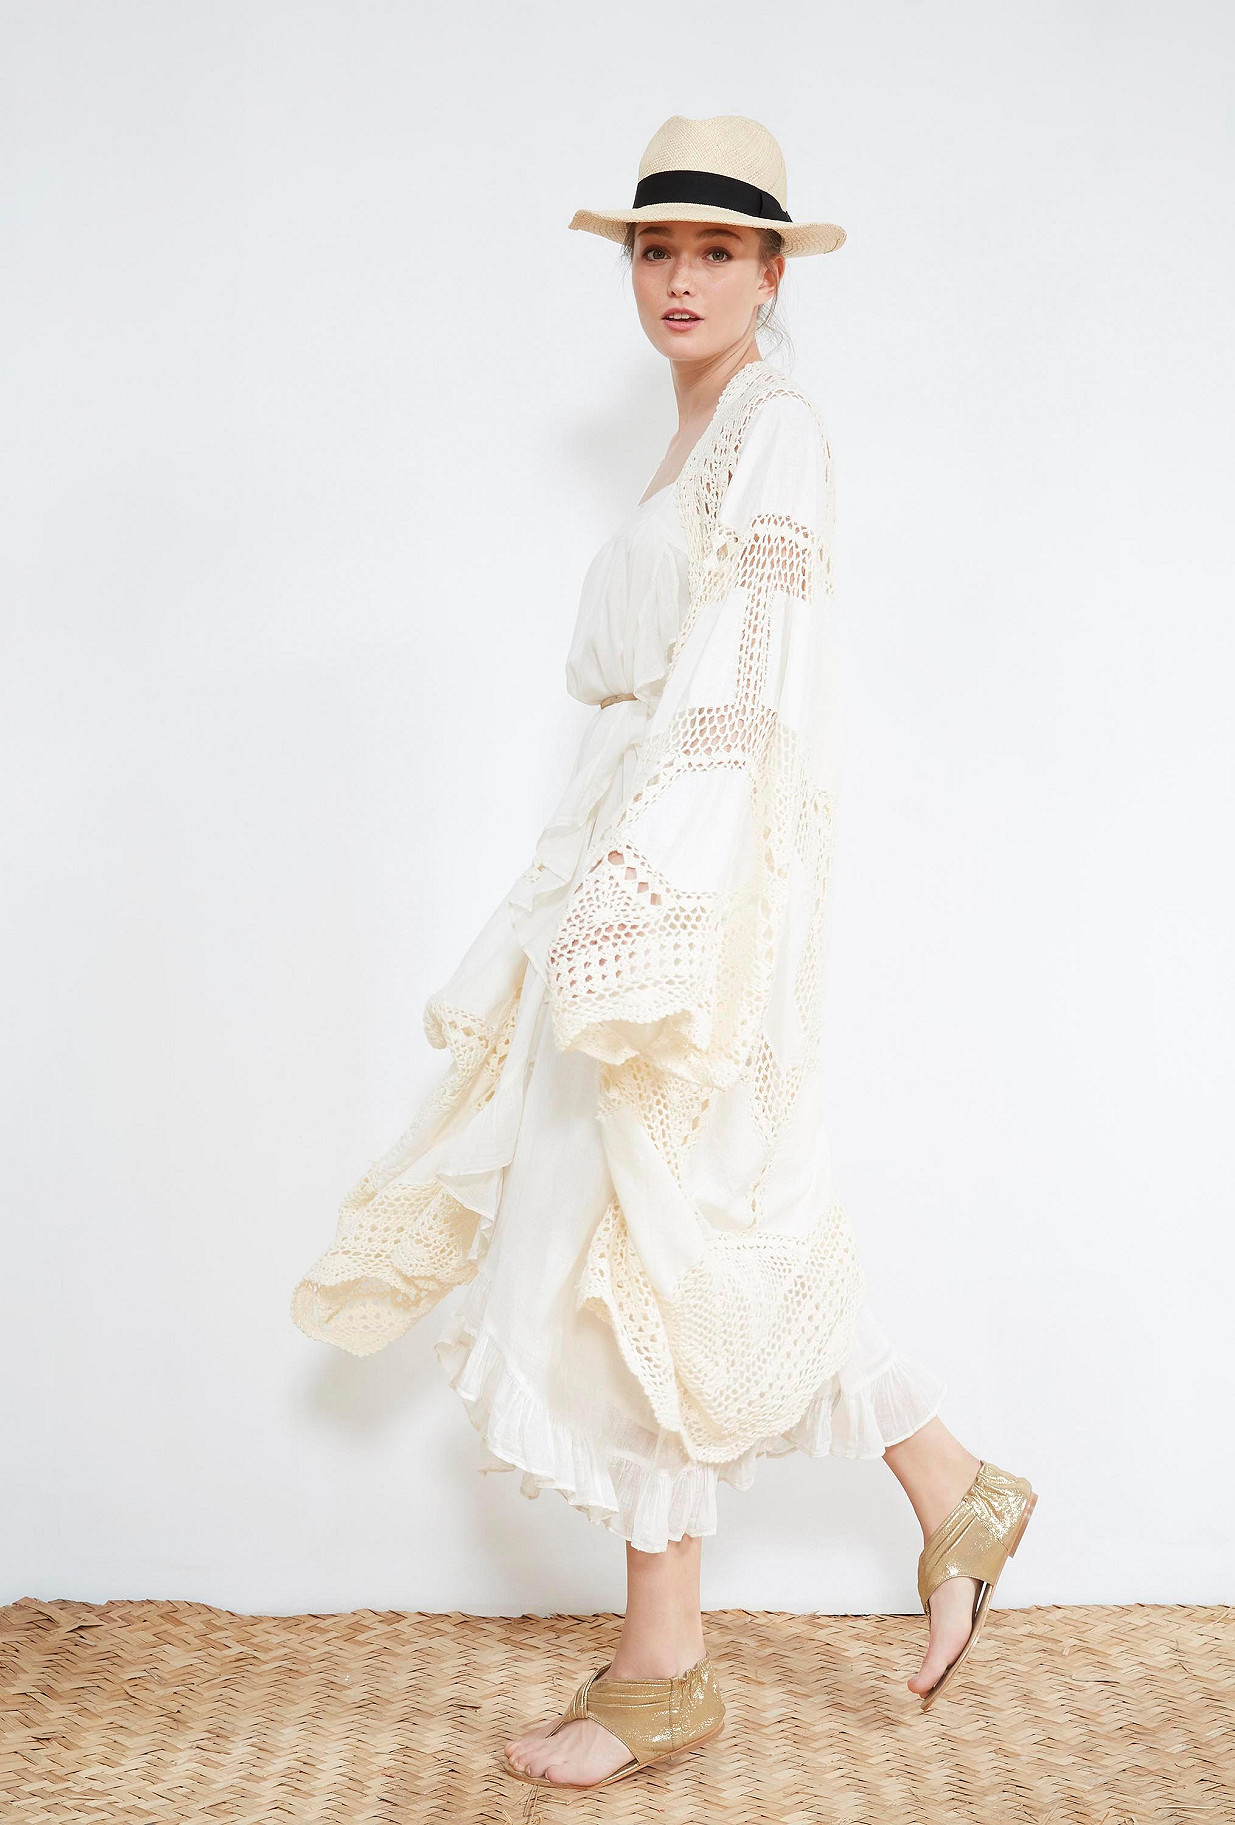 Ecru  KIMONO  Beauvoir Mes demoiselles fashion clothes designer Paris